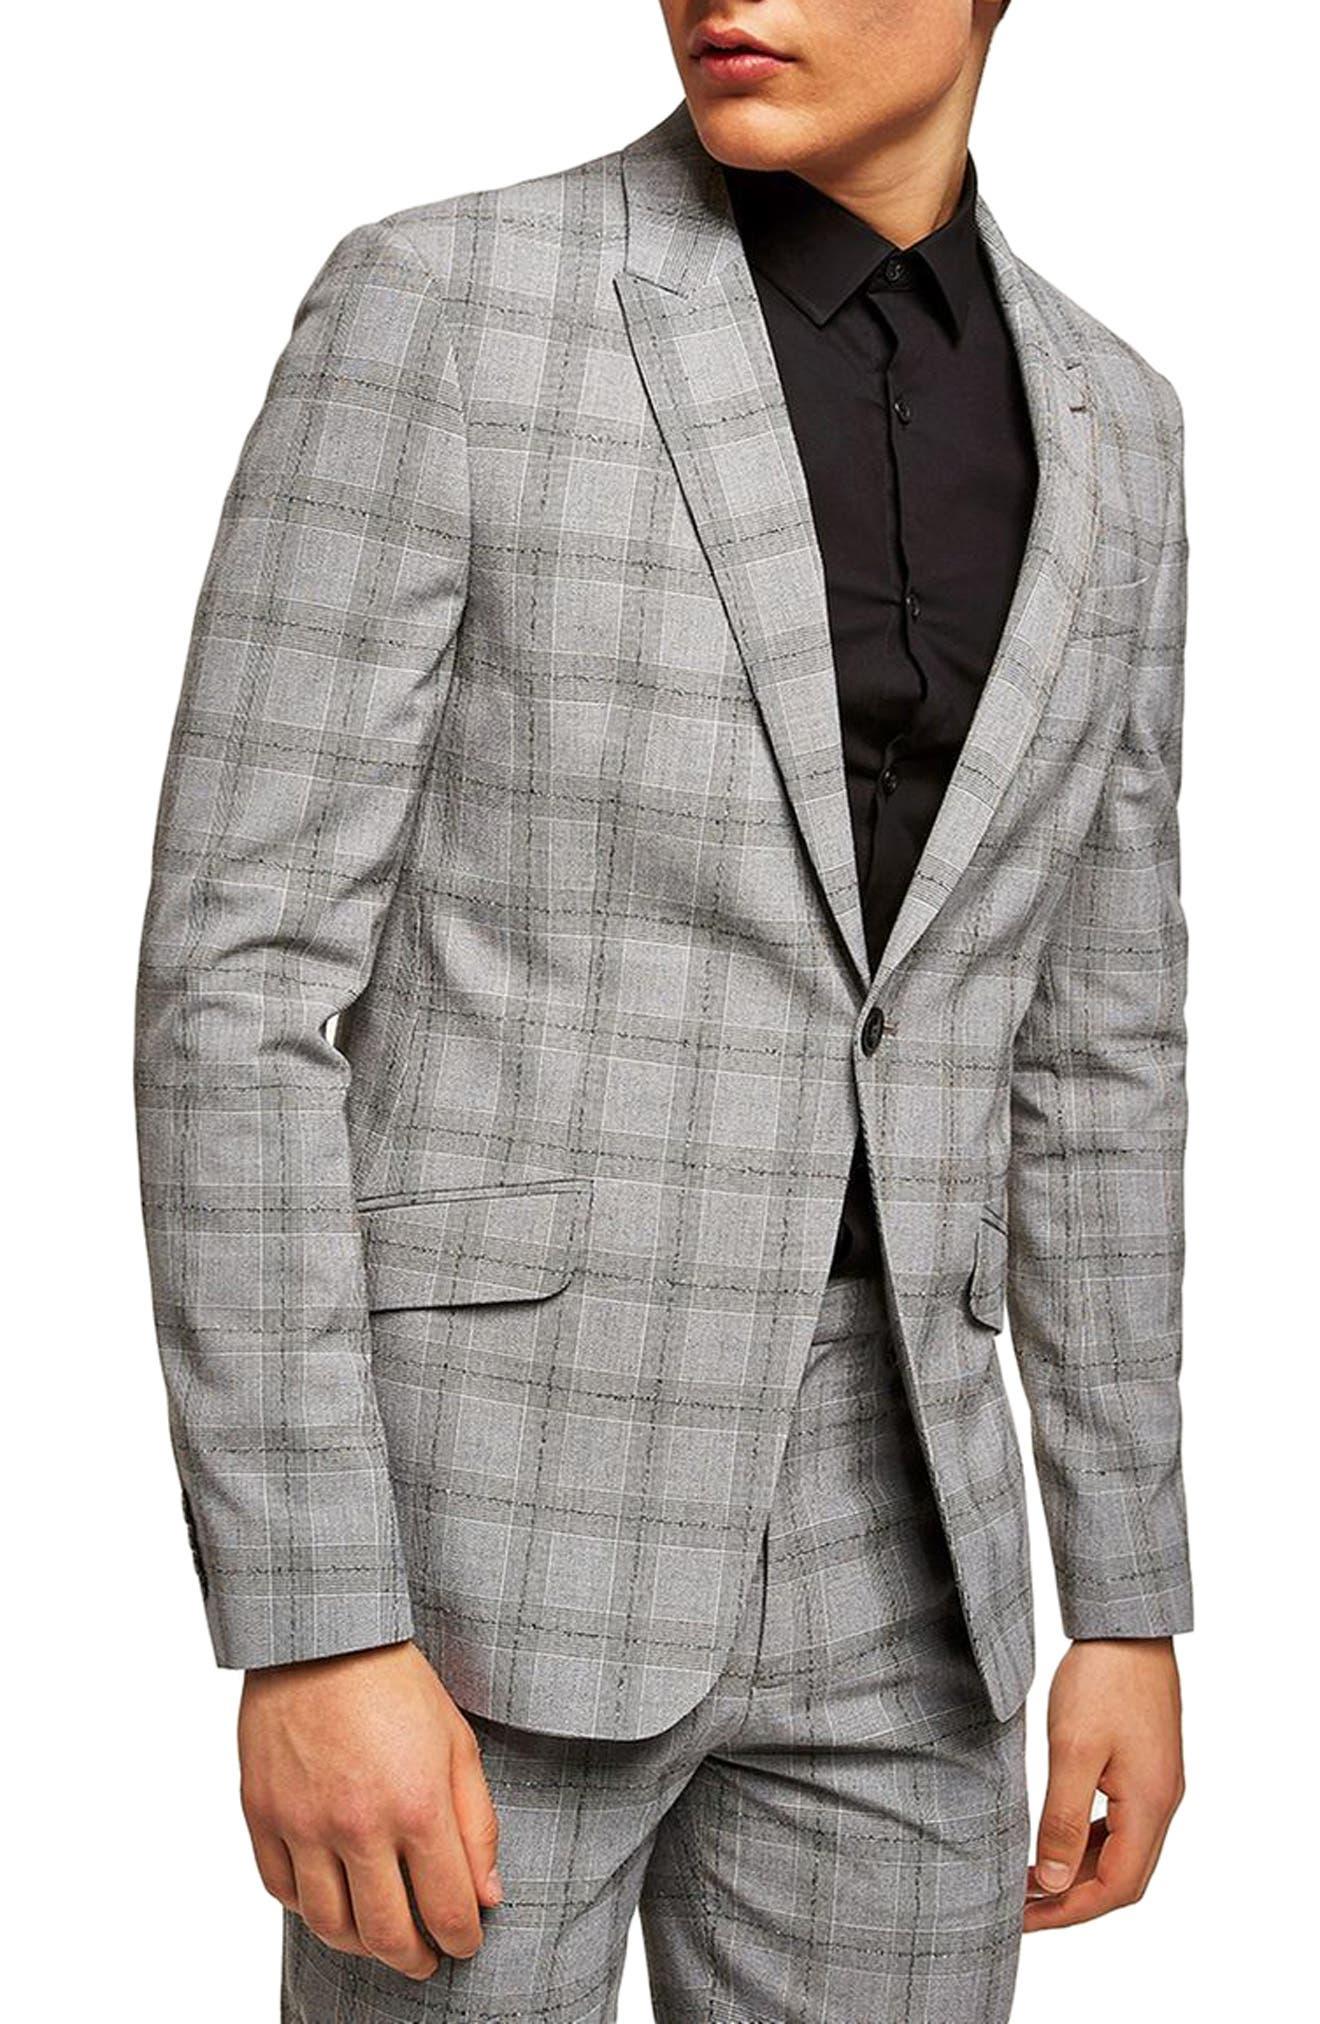 Topman Check Suit Jacket